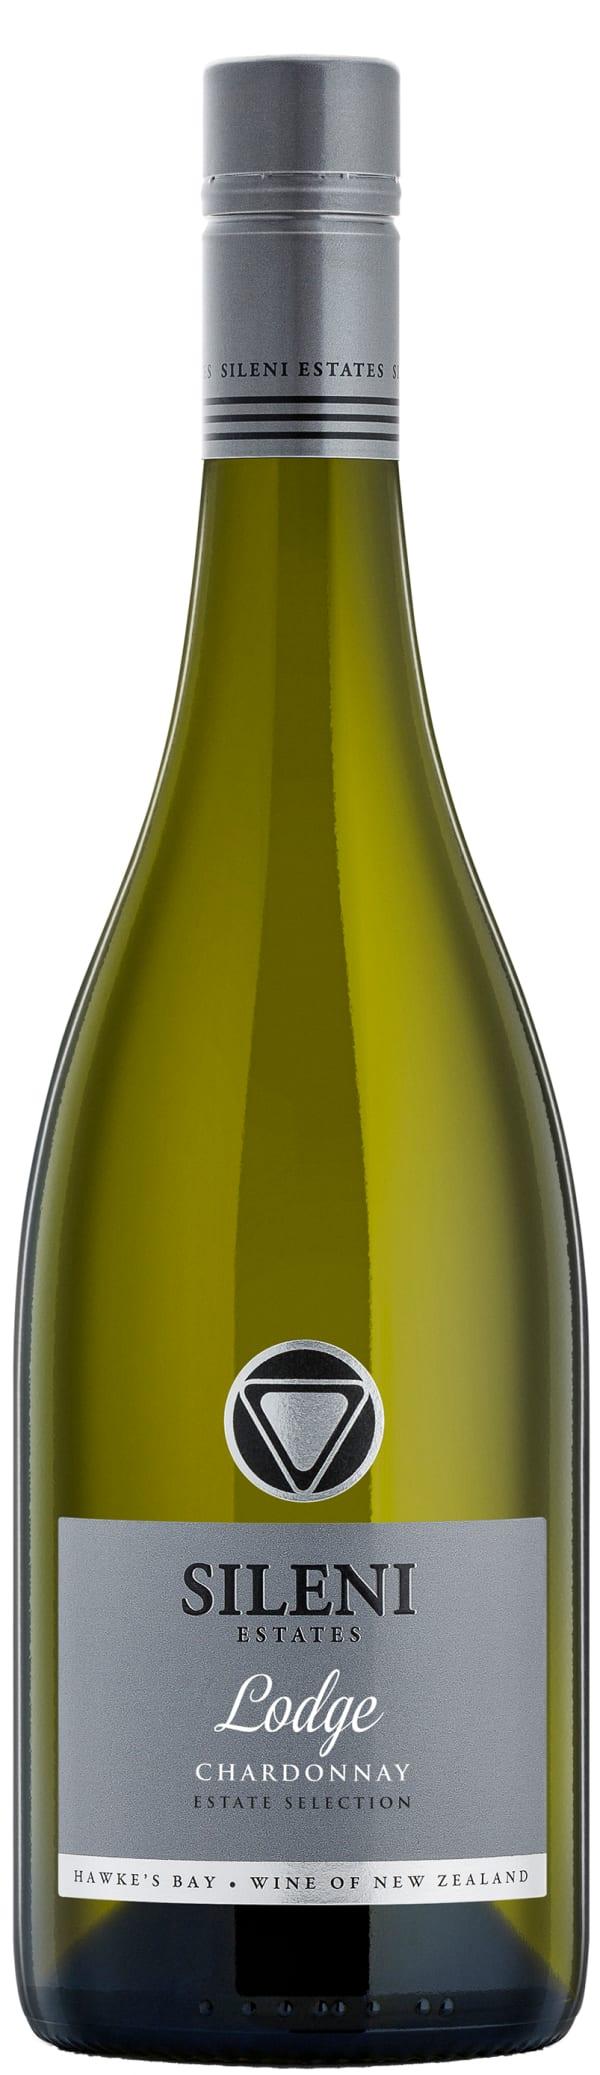 Sileni The Lodge Chardonnay 2017